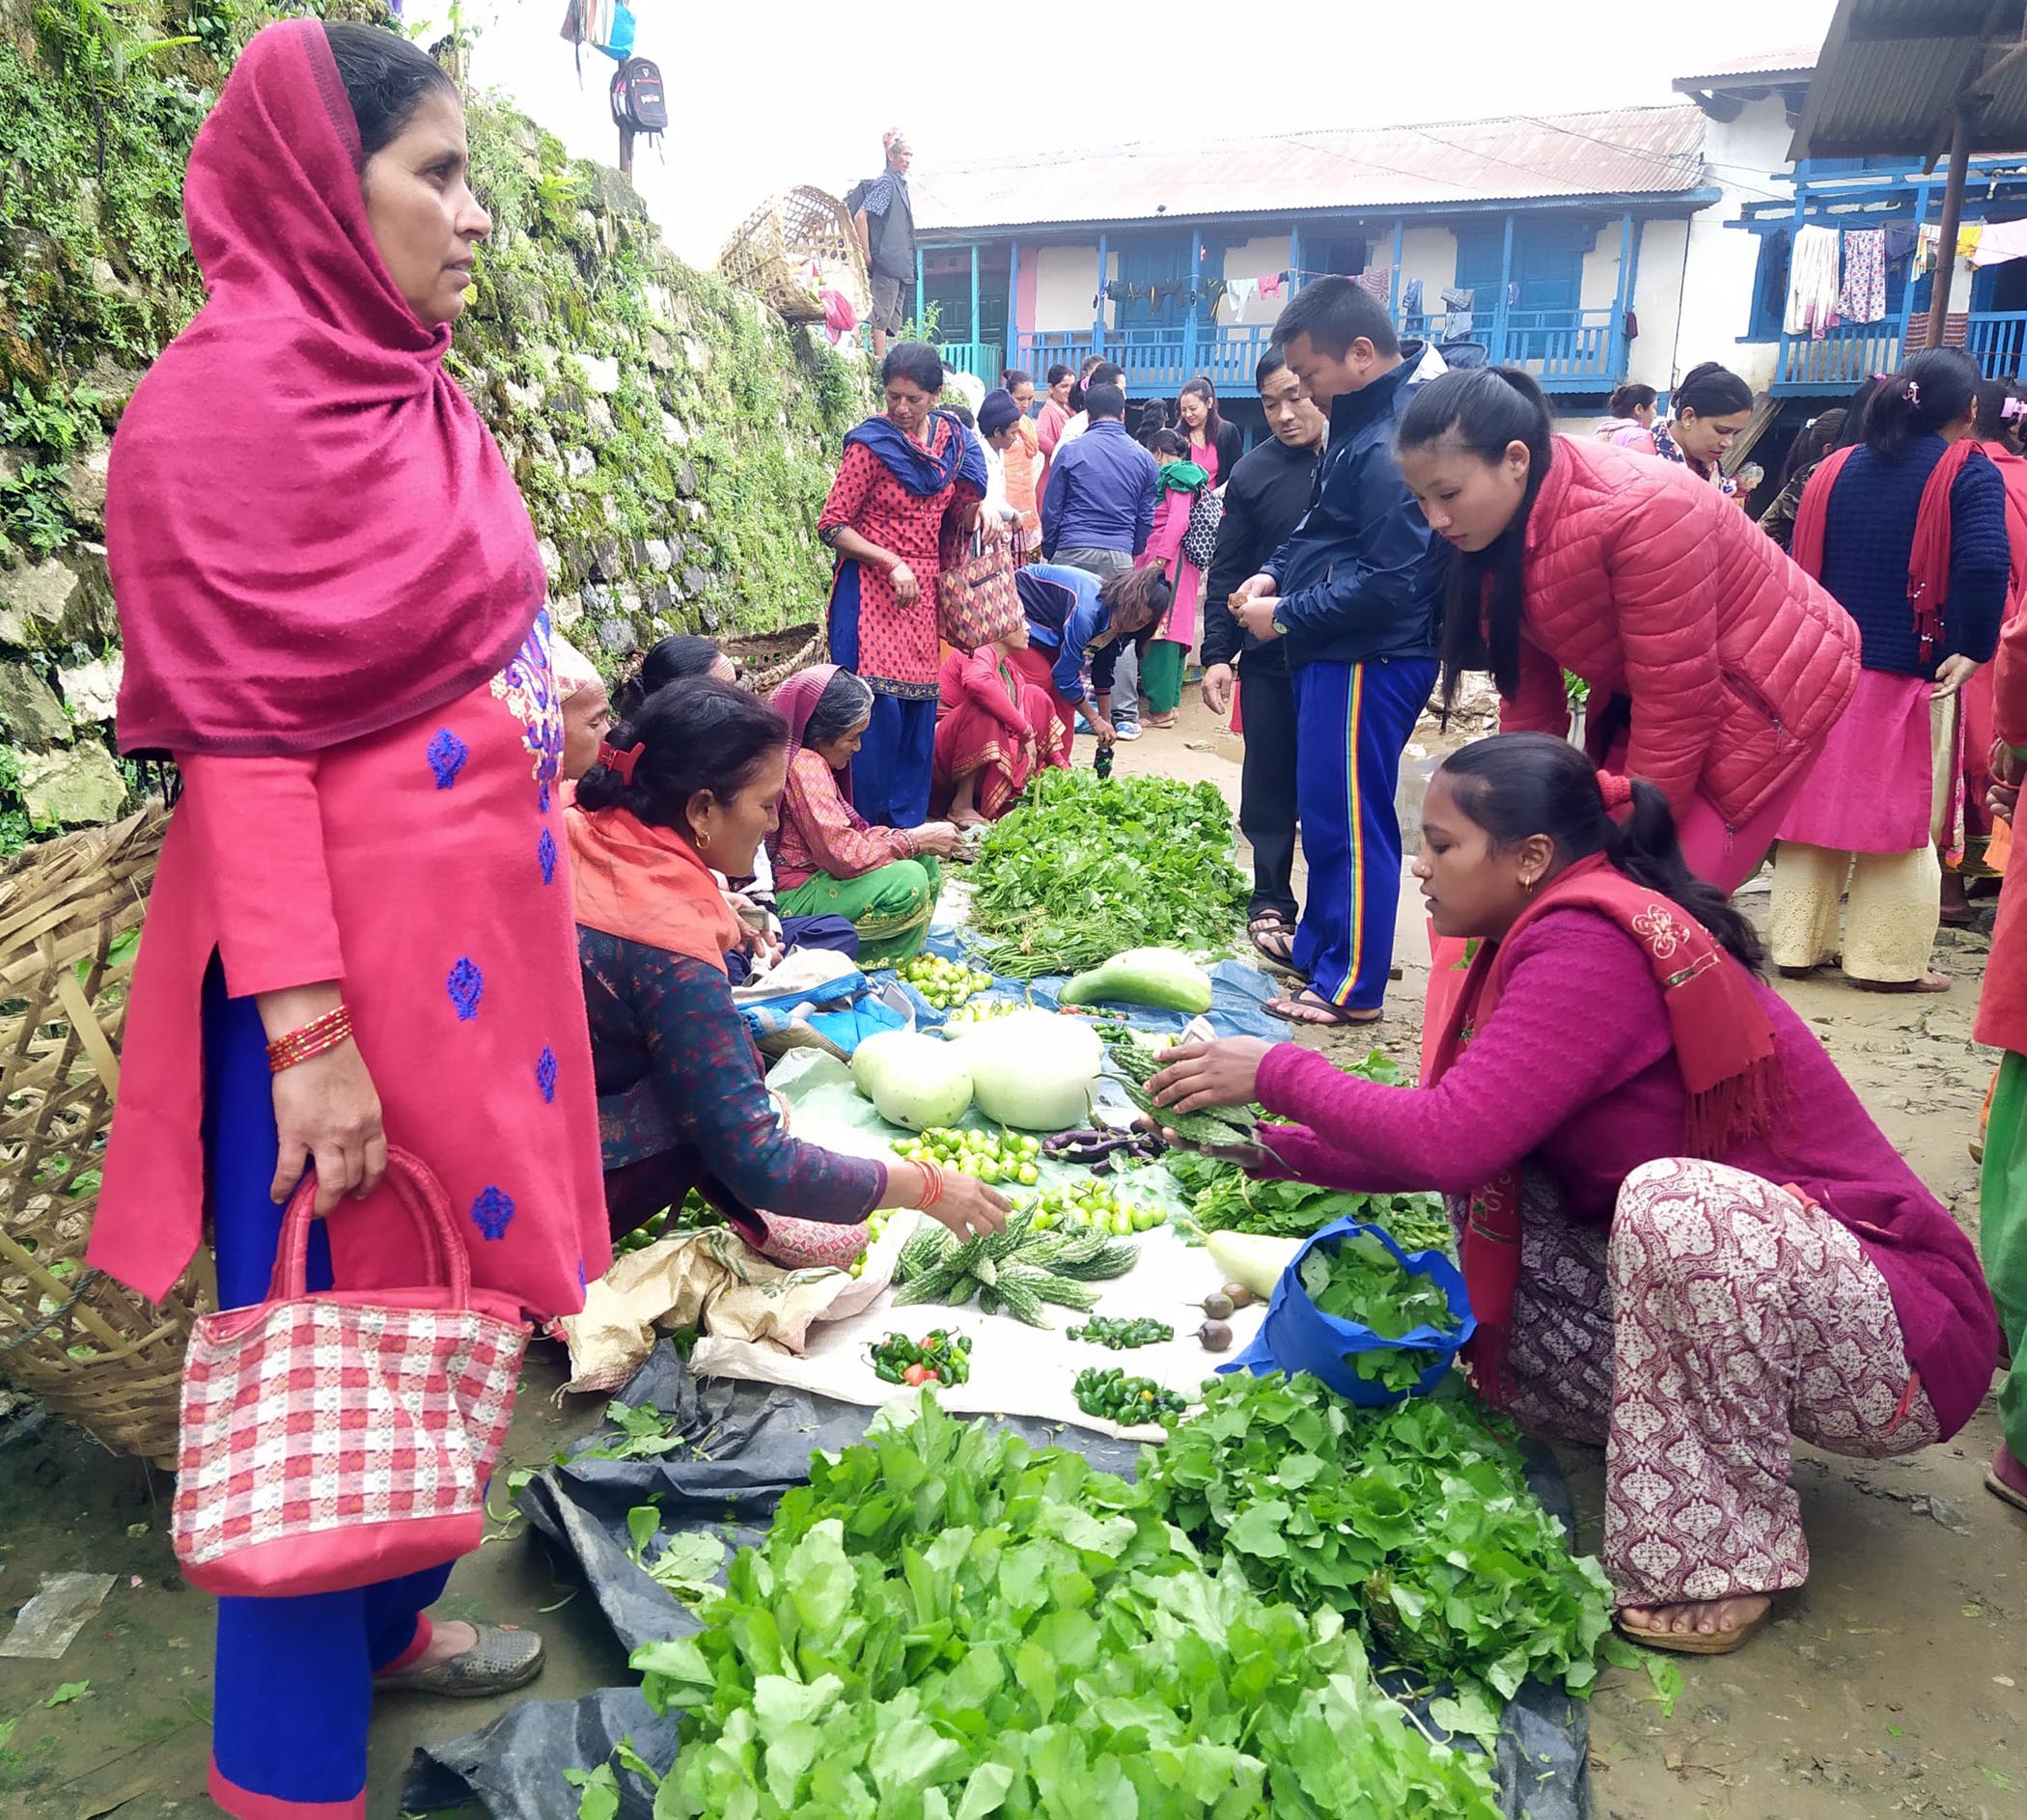 Glimpses of Hatiya market in Khotang